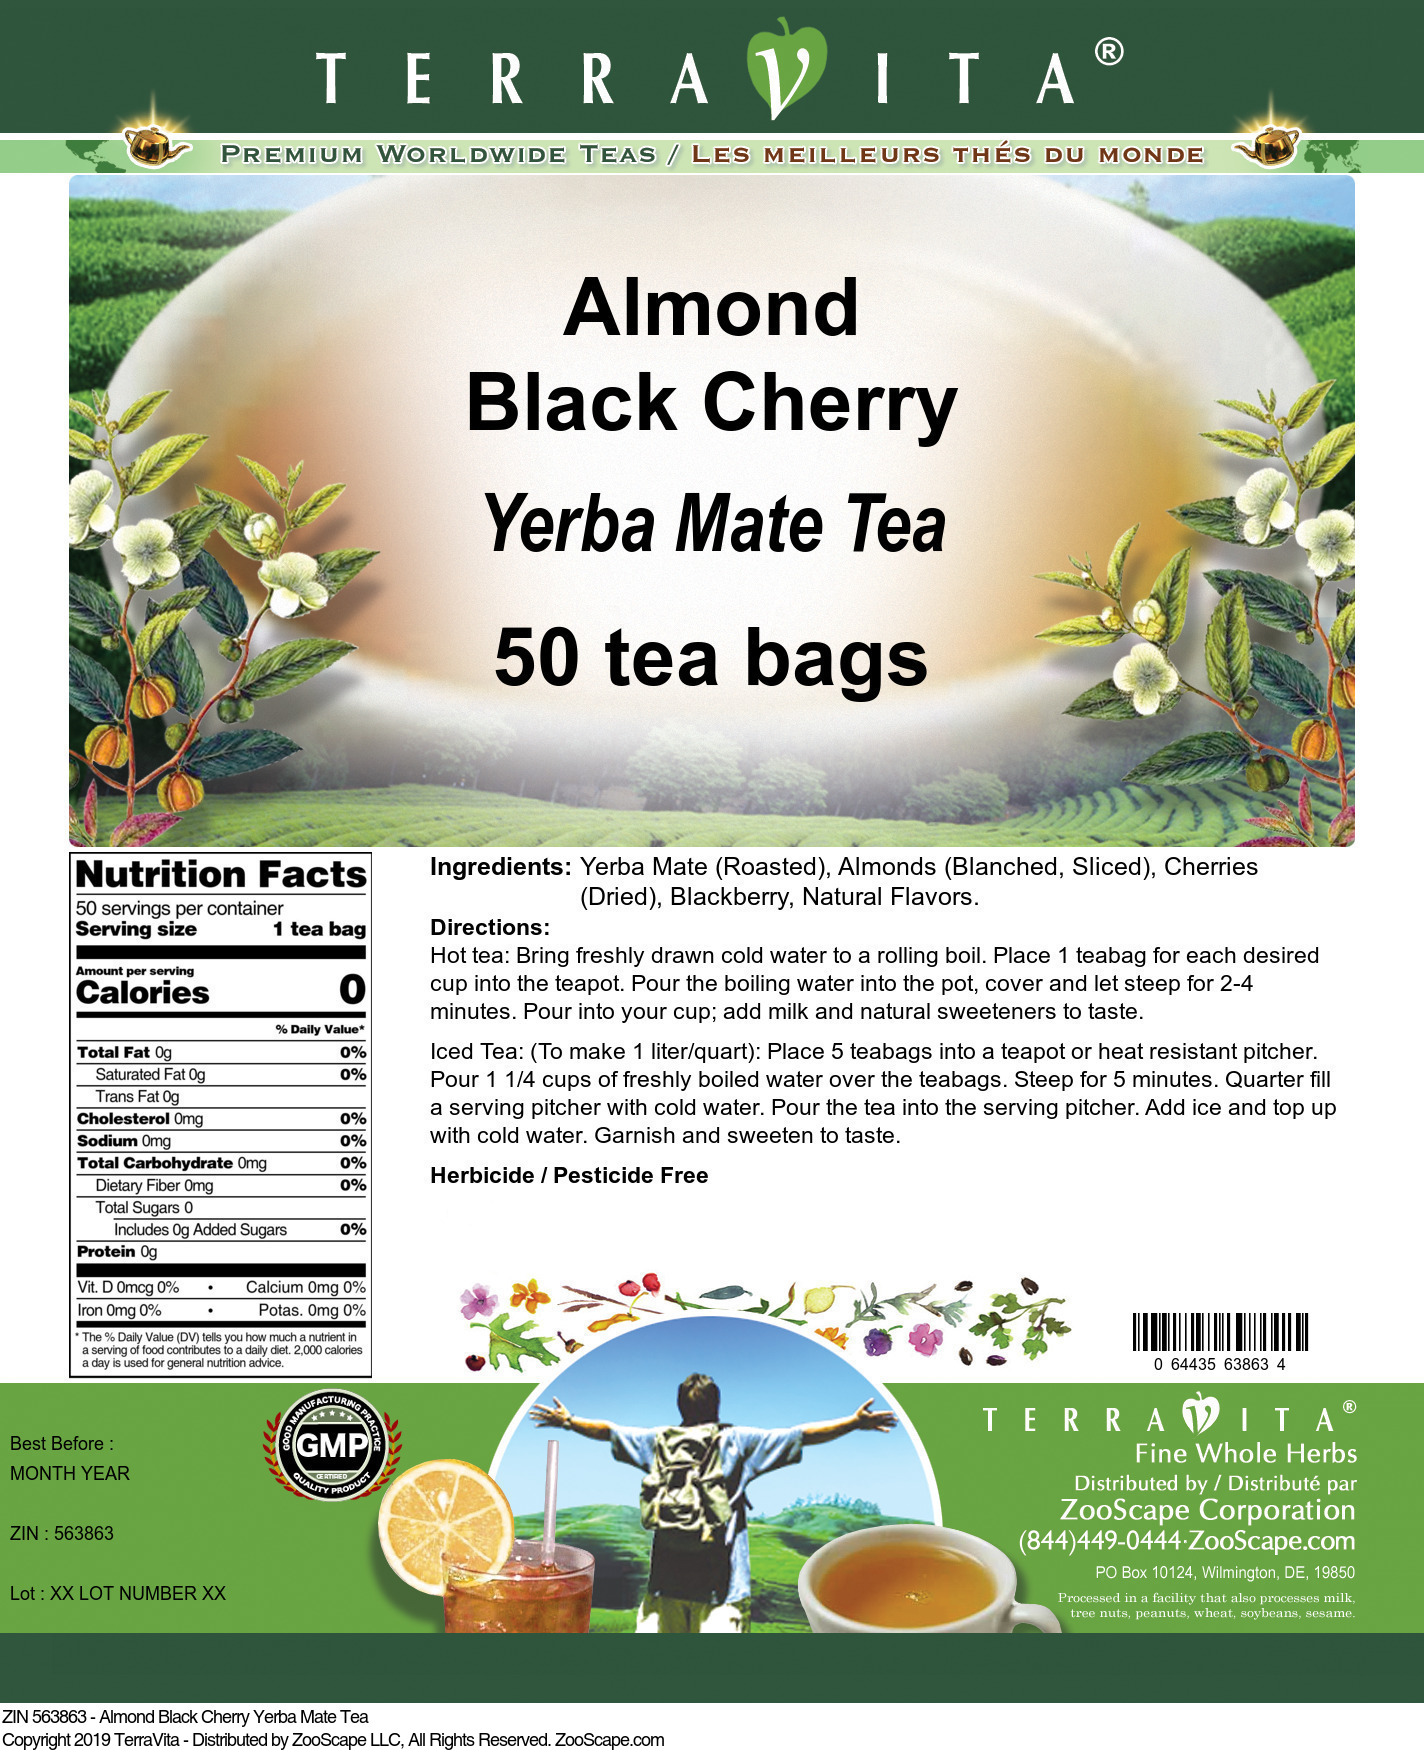 Almond Black Cherry Yerba Mate Tea